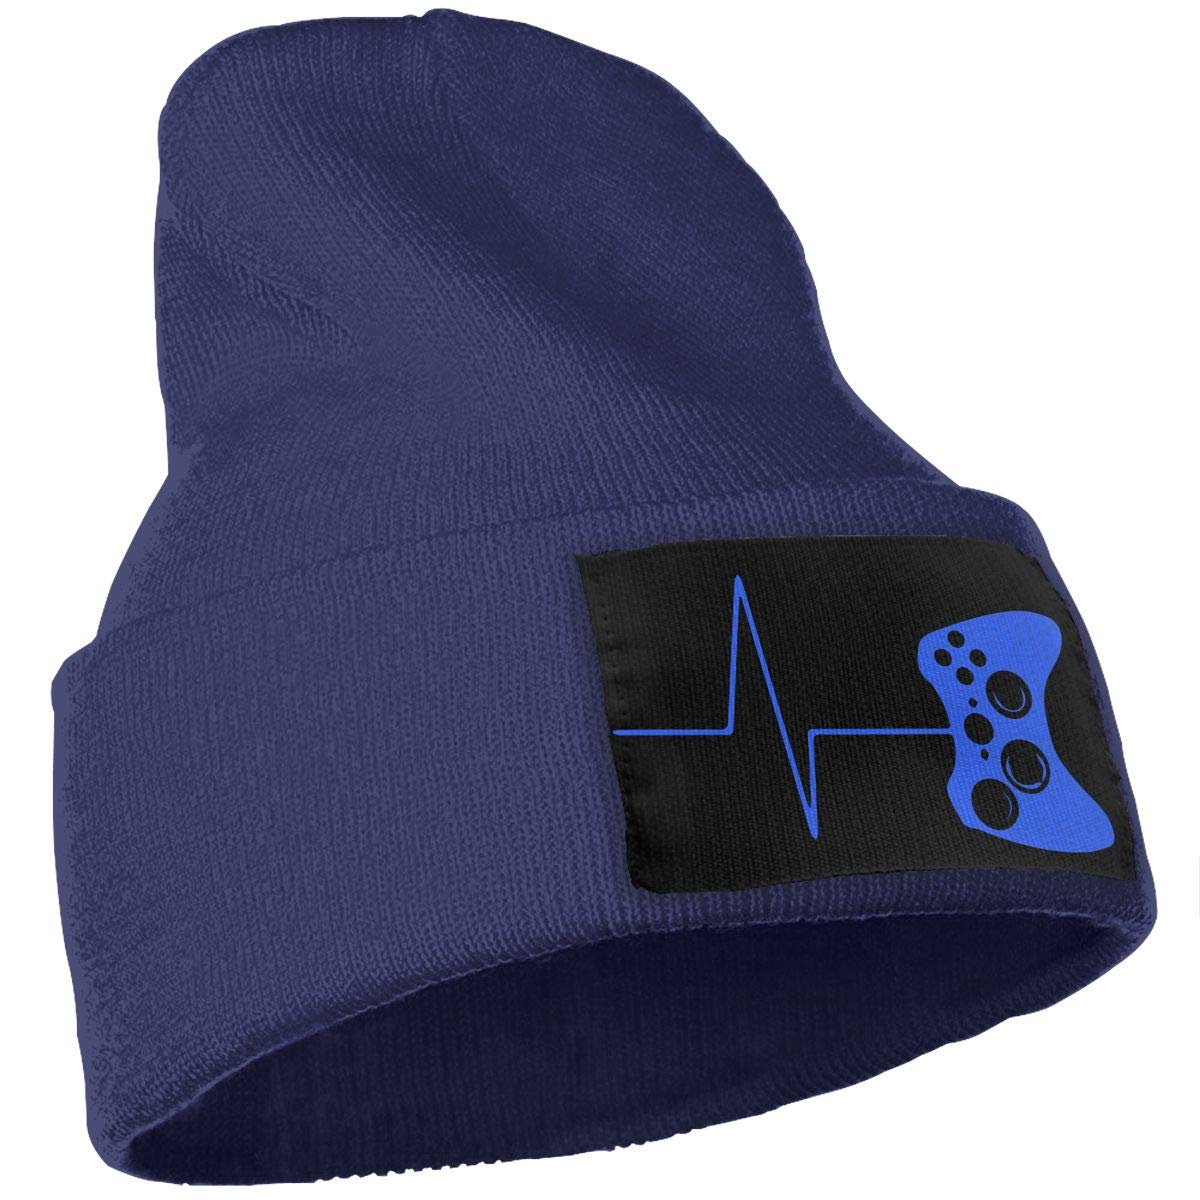 Mens Womens 100/% Acrylic Knit Hat Cap Heartbeat of A Gamer Fashion Skull Cap